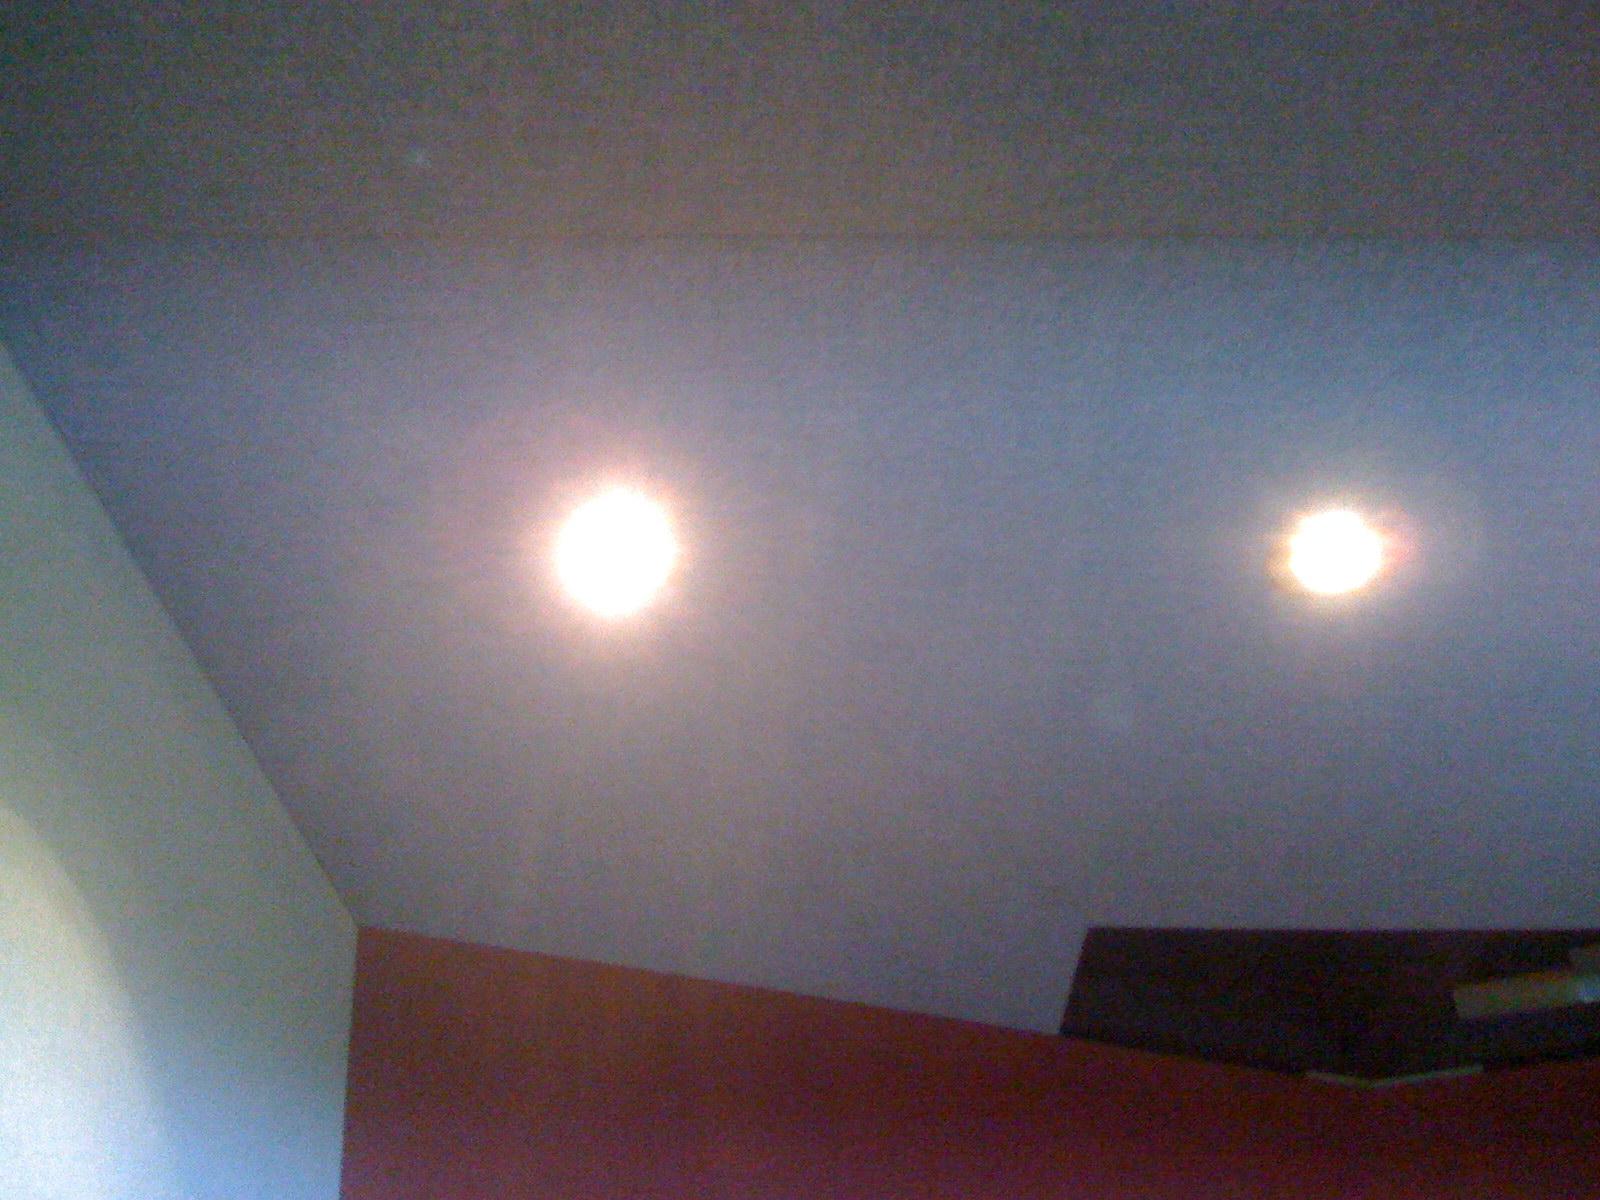 Control room lights set to 'interrogation mode'...